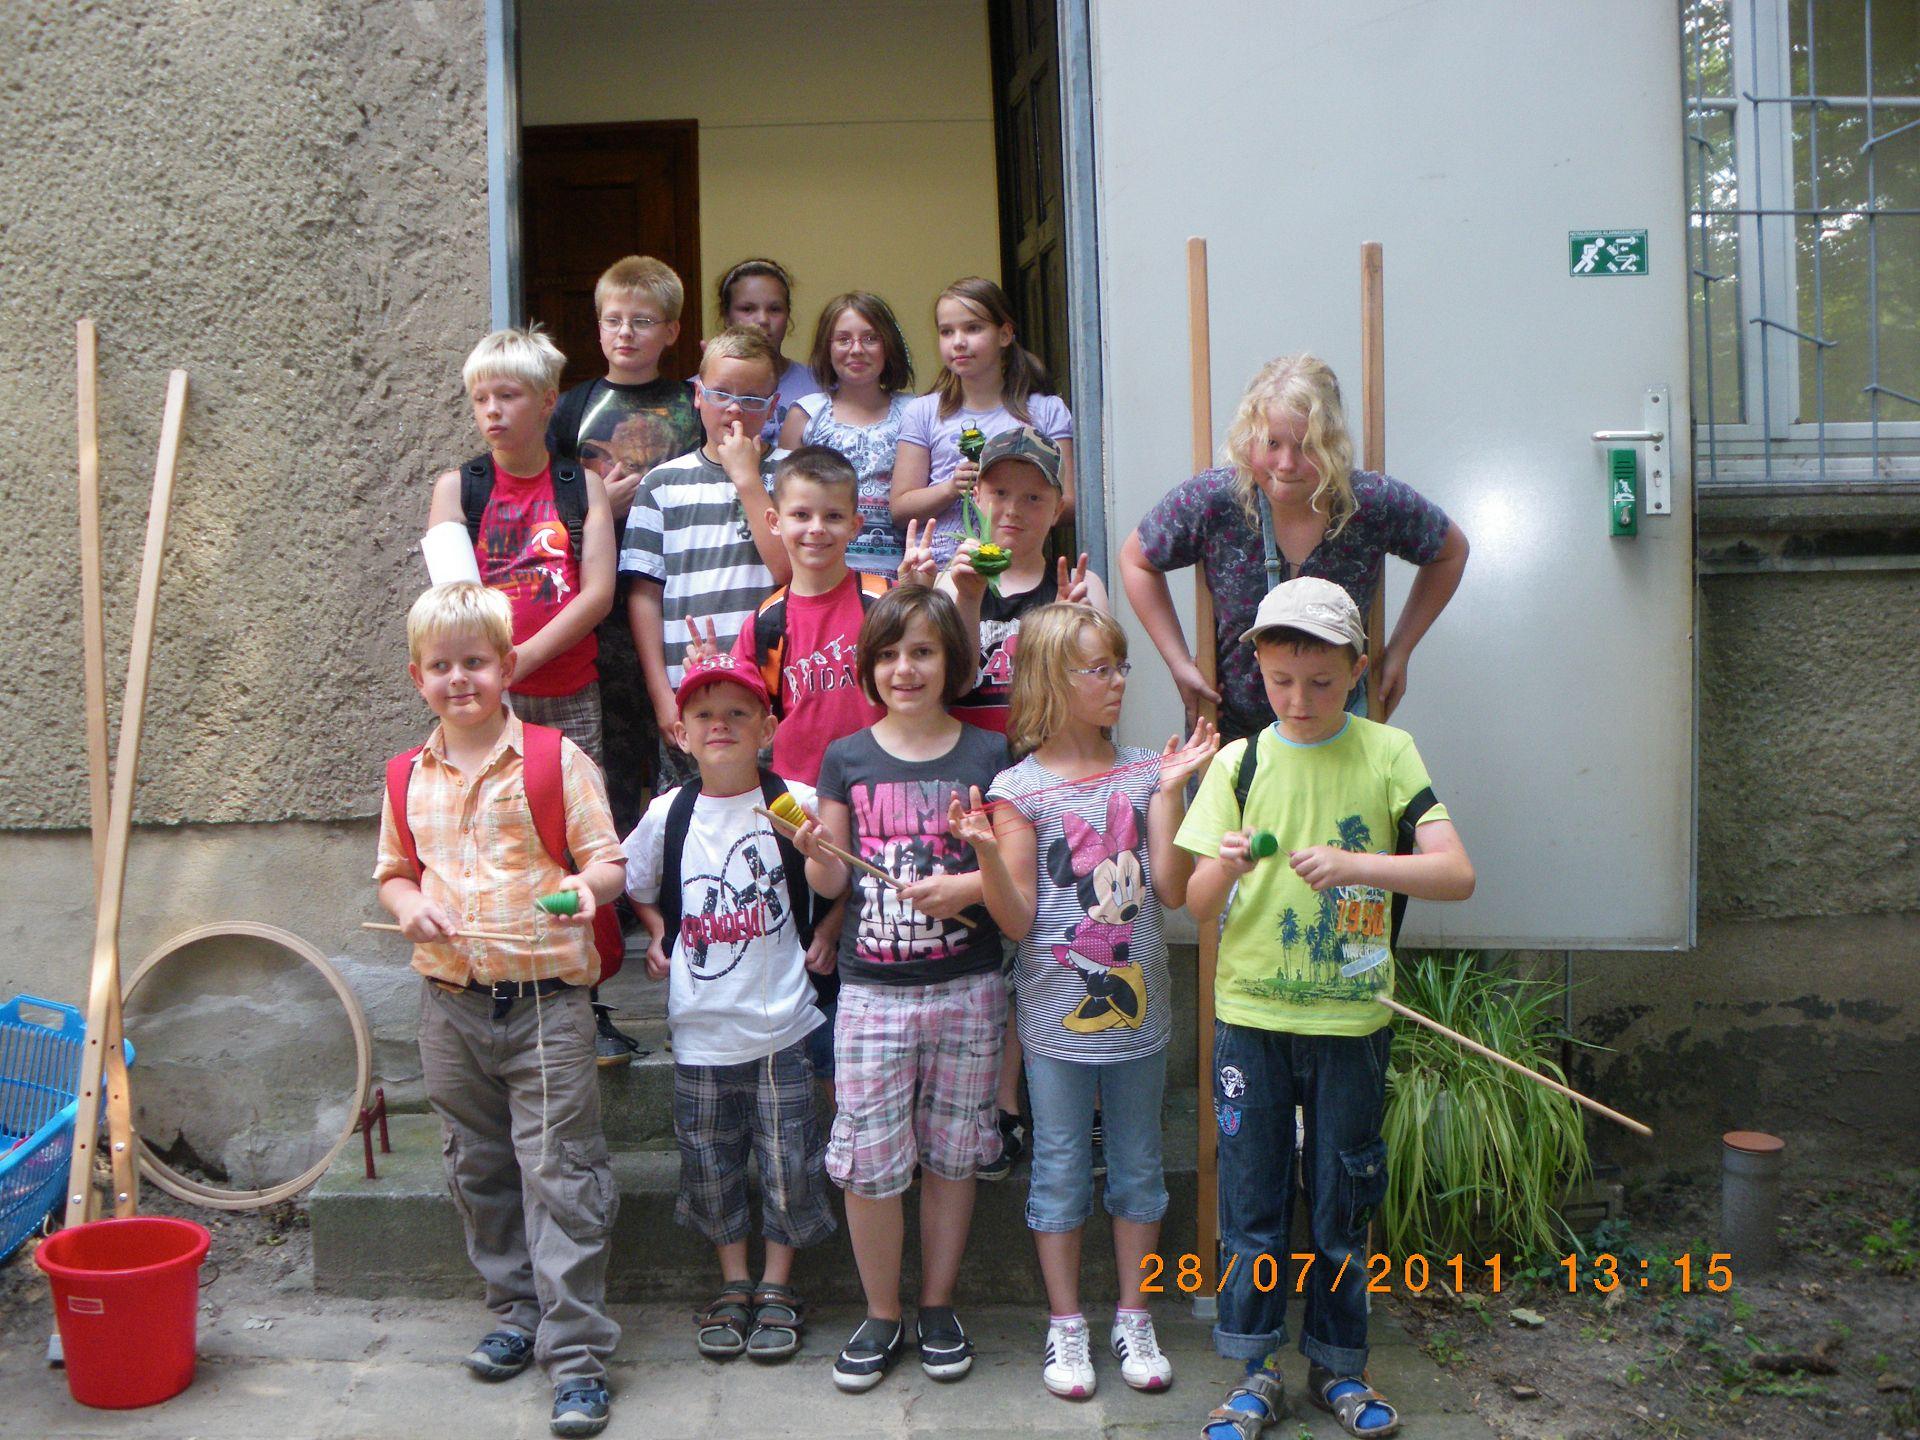 Kinderprogramm: Alte Kinderspiele